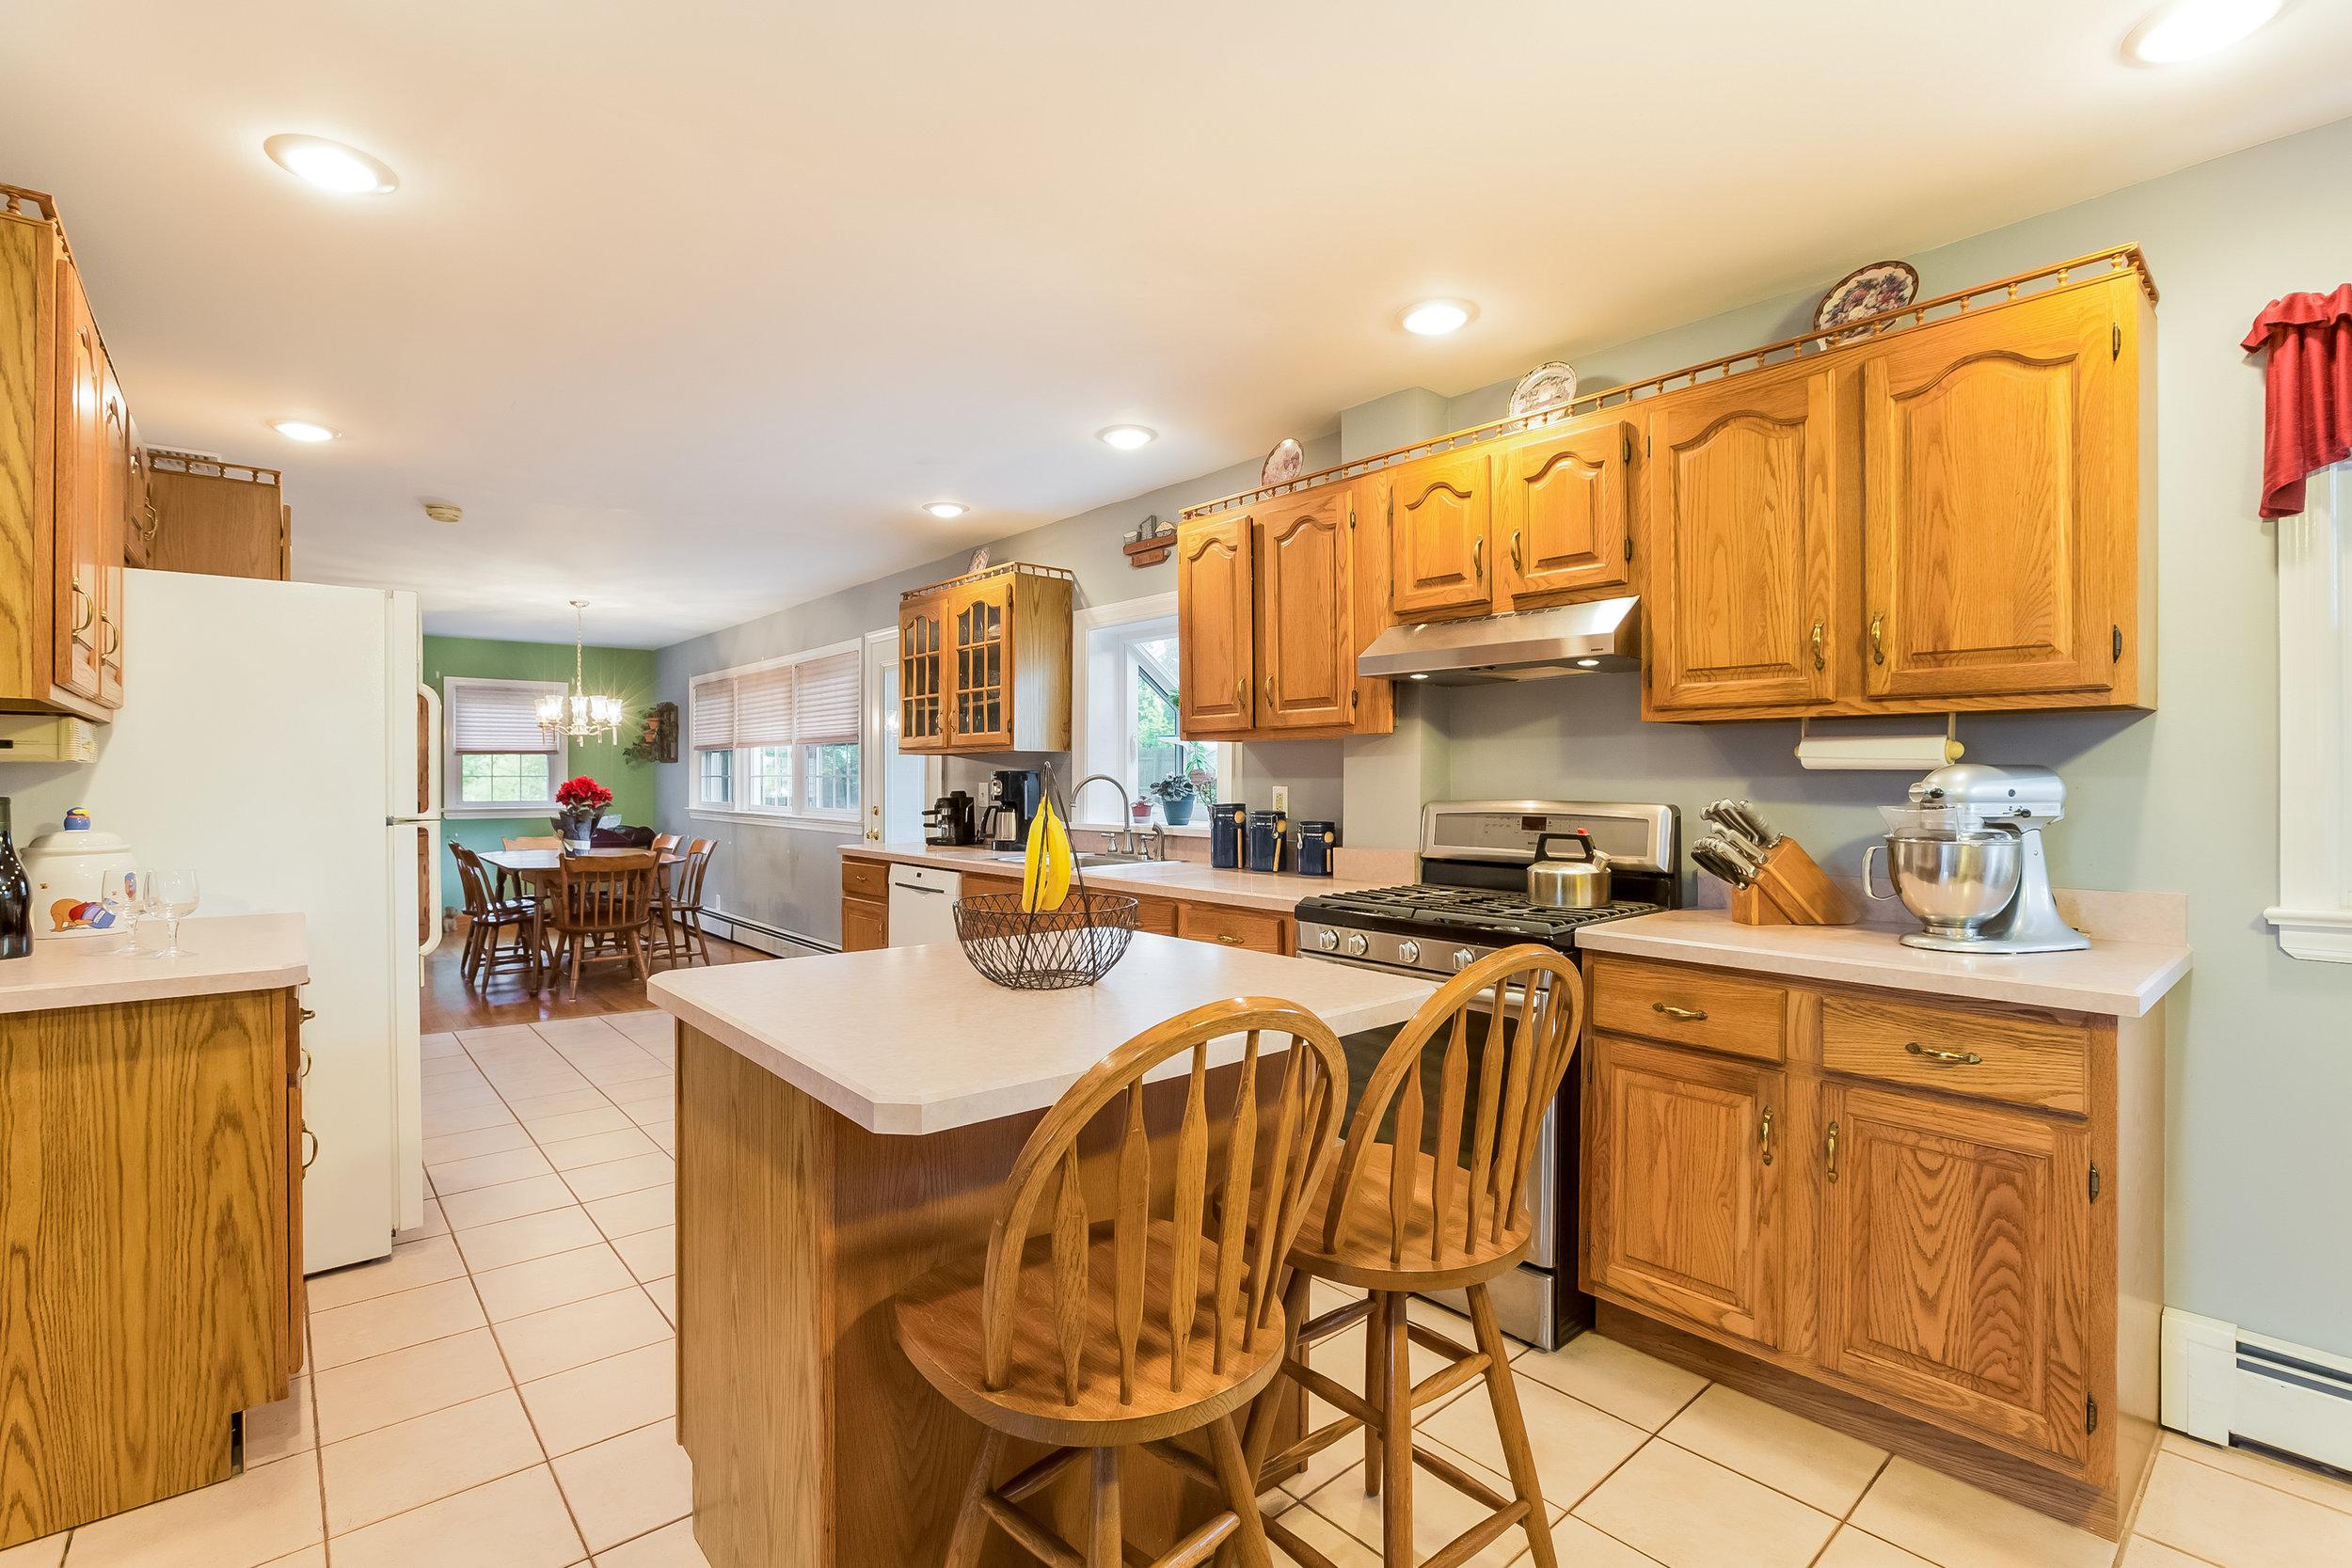 019-Kitchen-5002147-large.jpg